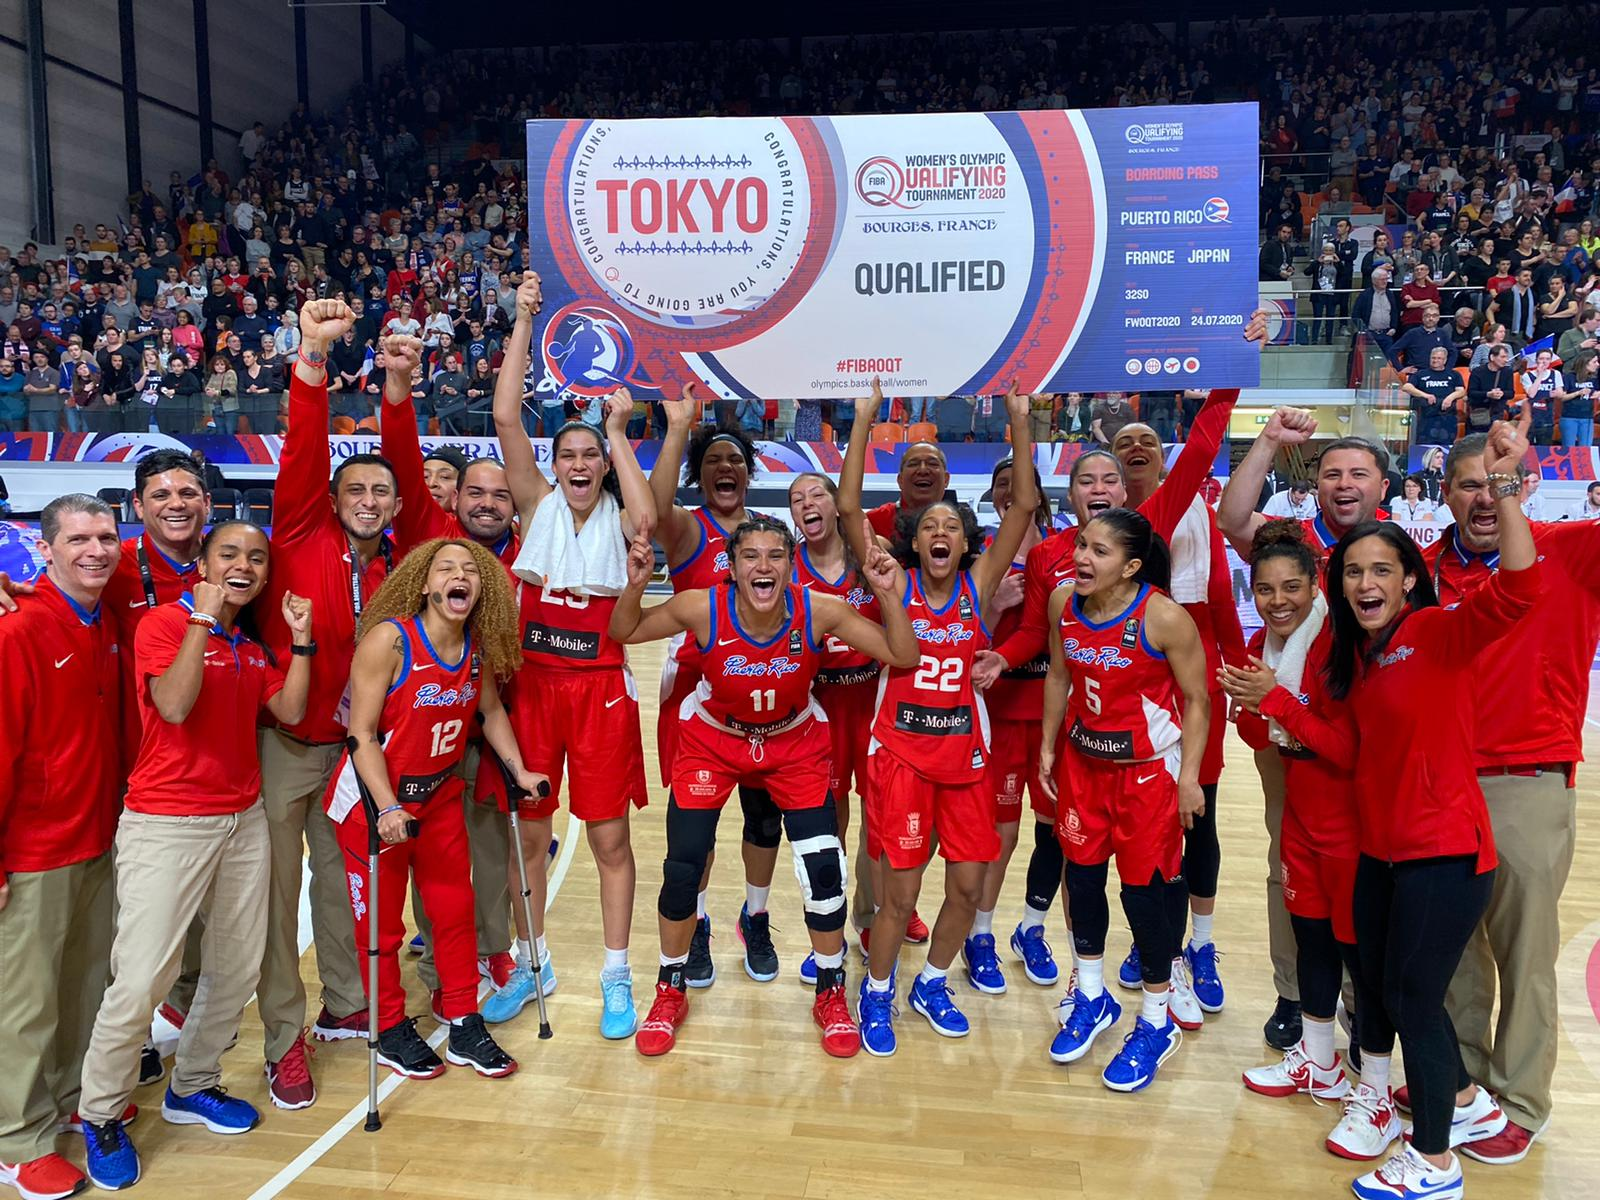 Baloncesto femenino Puerto Rico clasifica a Tokio 2020